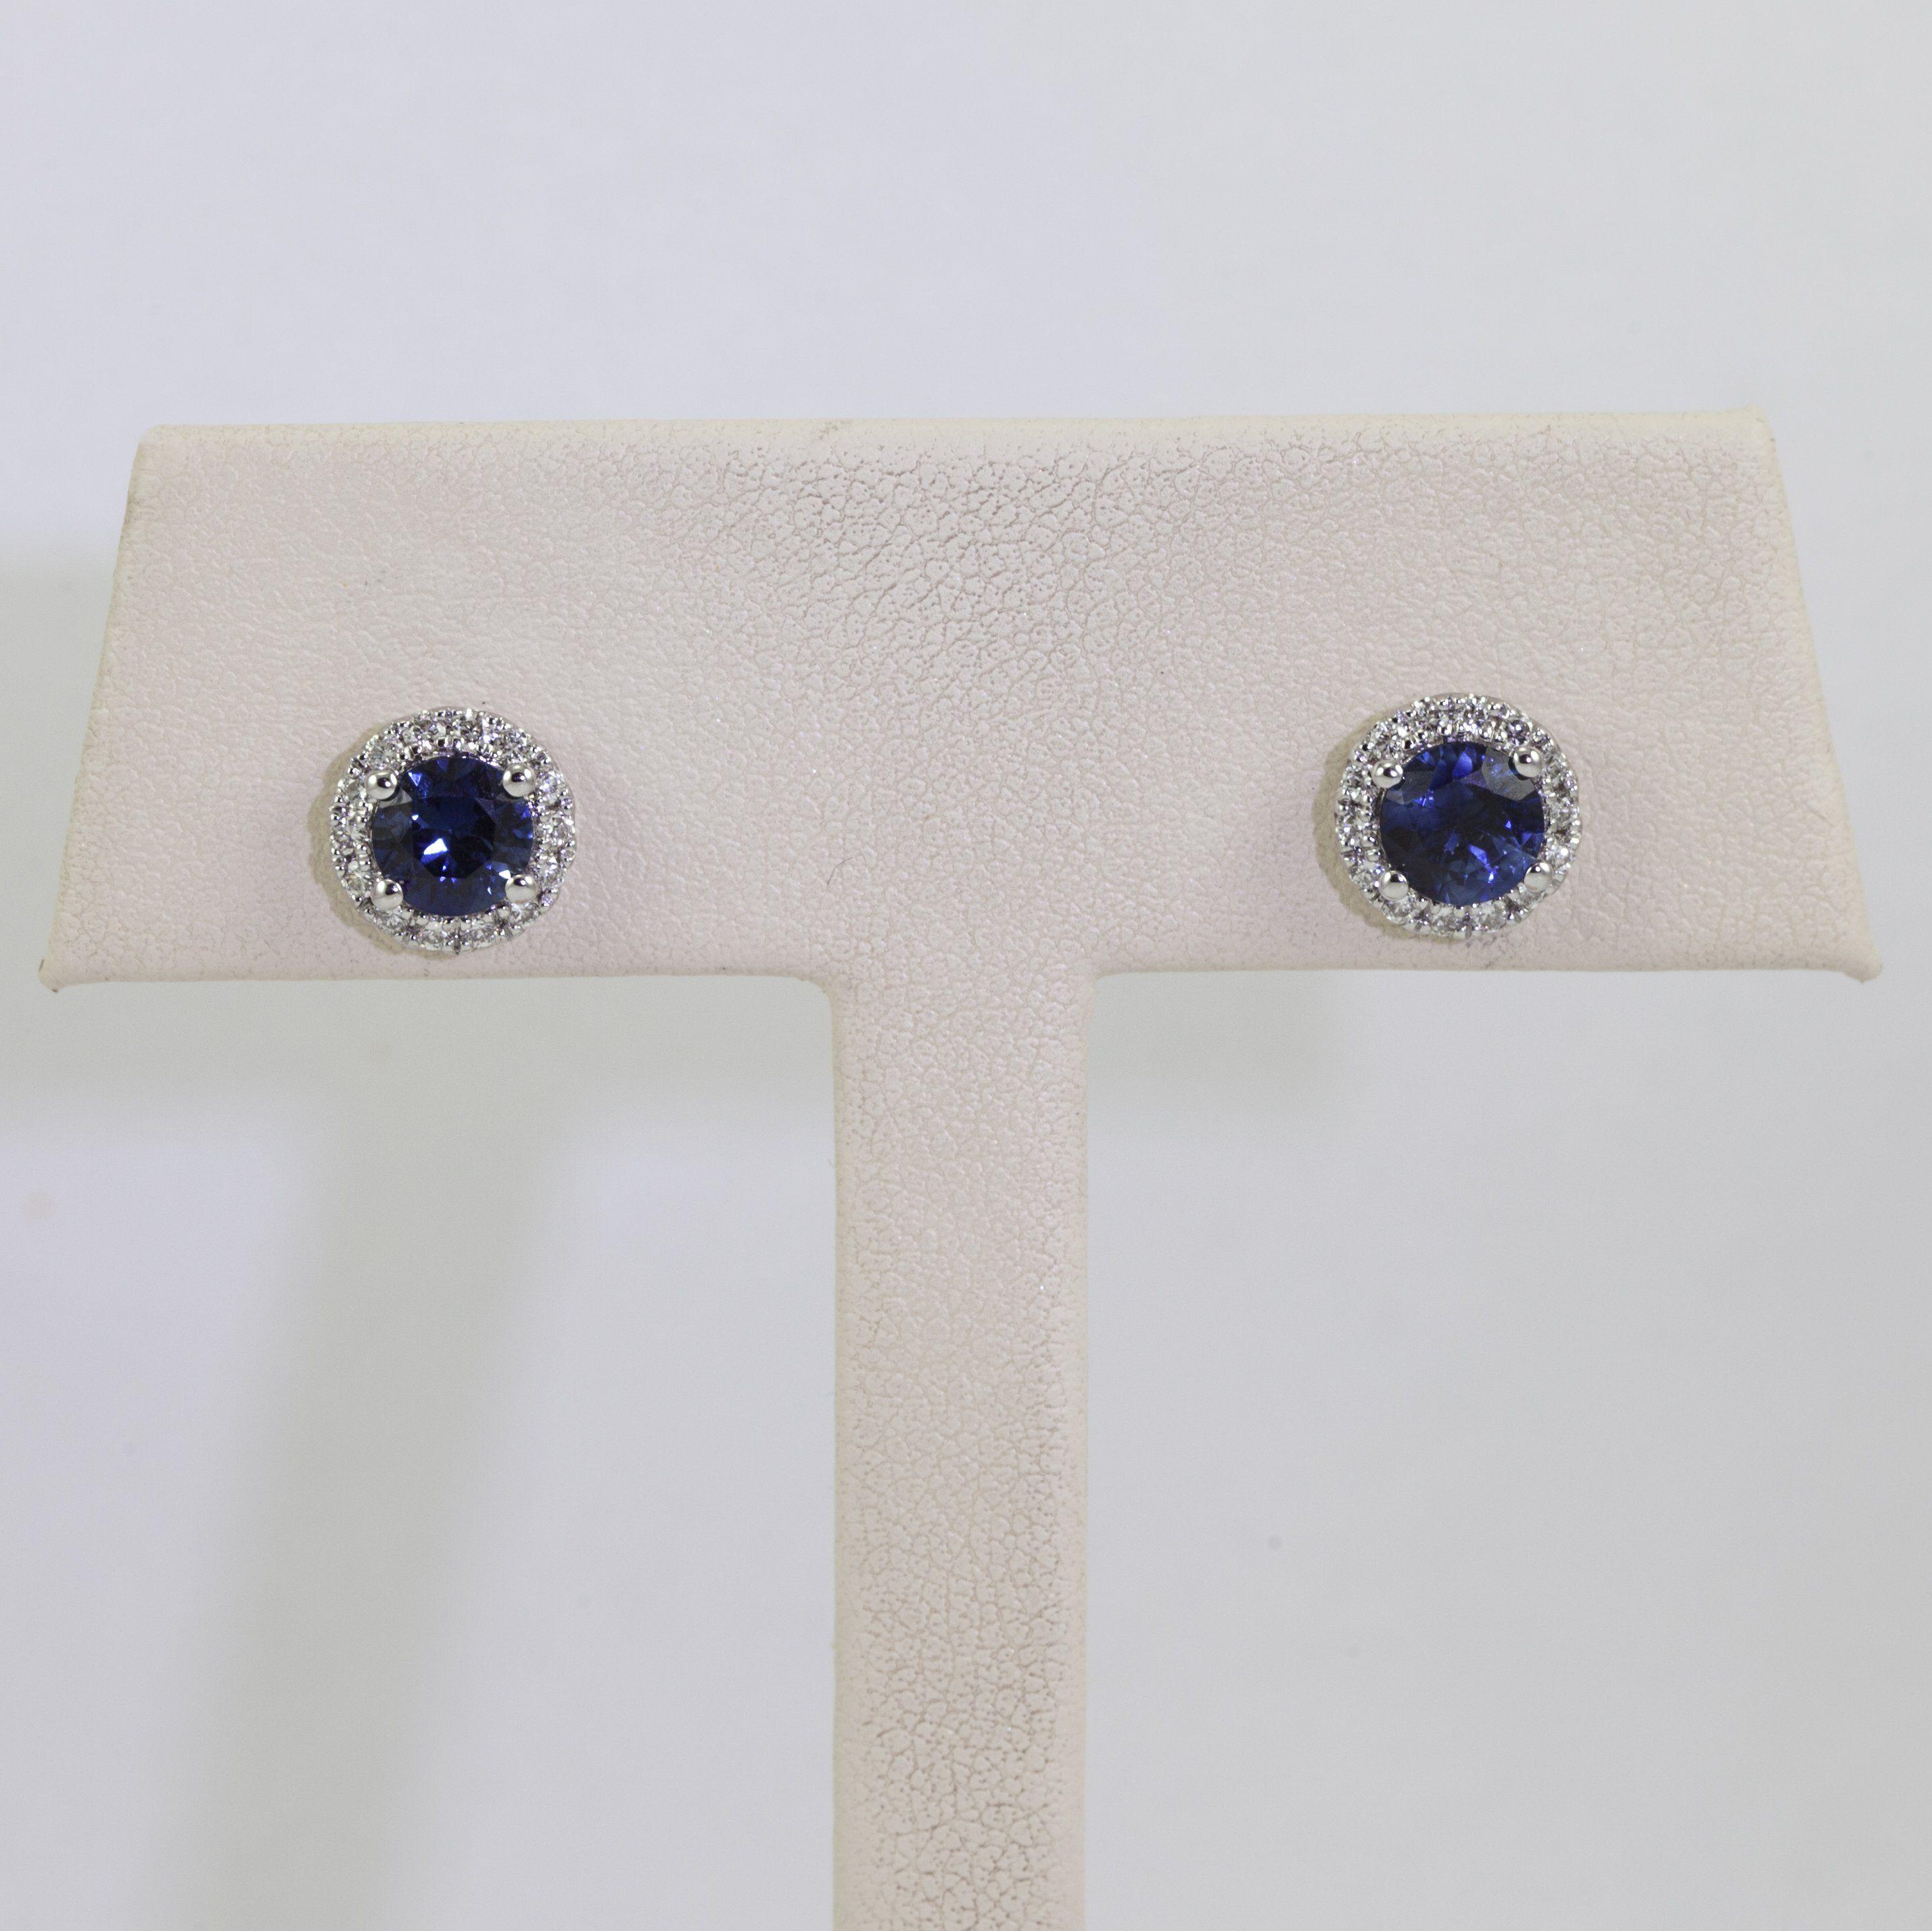 14K White Gold Sapphire and Diamond Stud Earrings